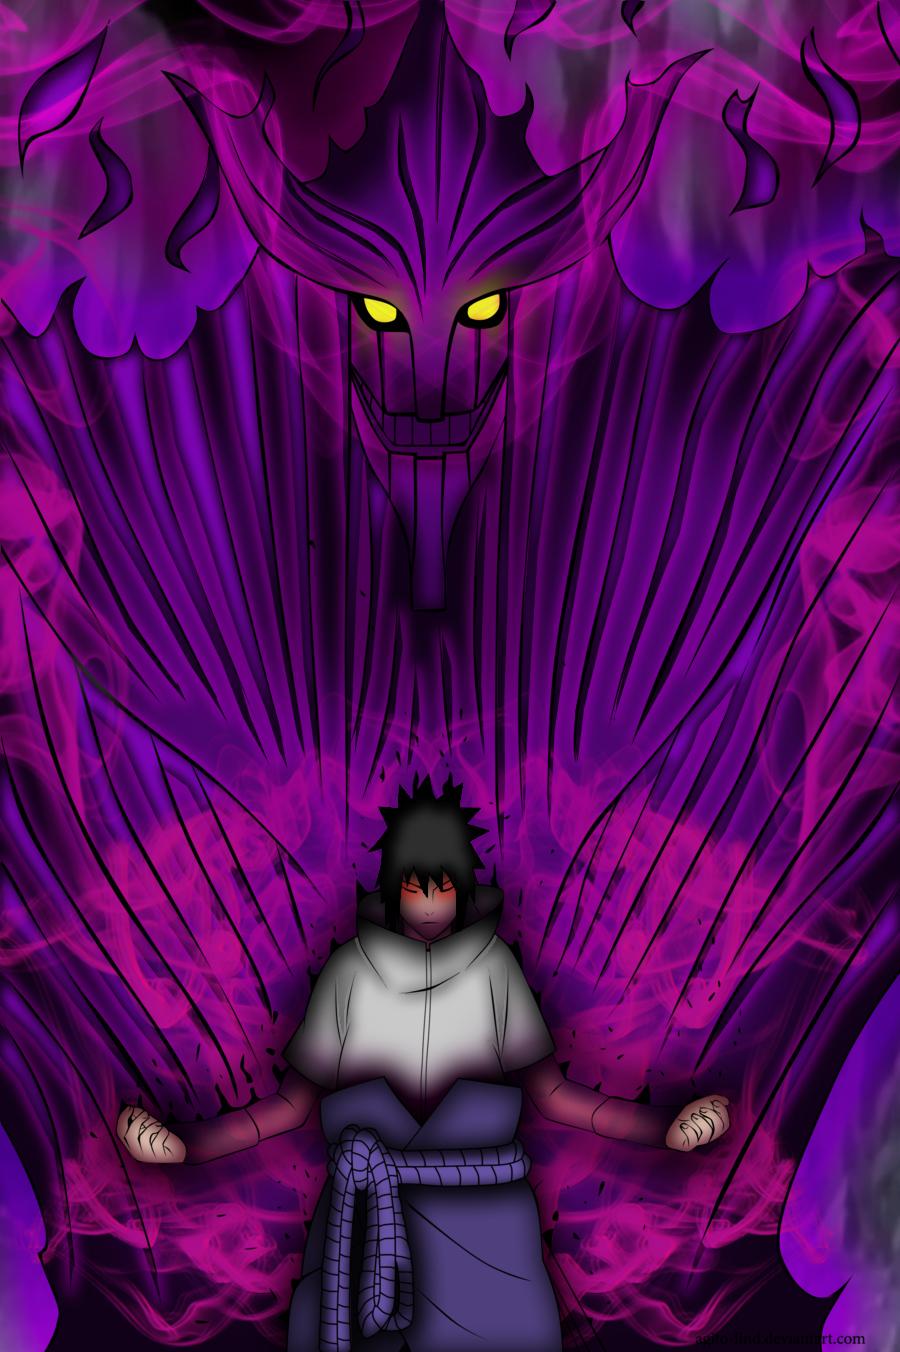 Sasuke Susano'o by EspadaZero on DeviantArt